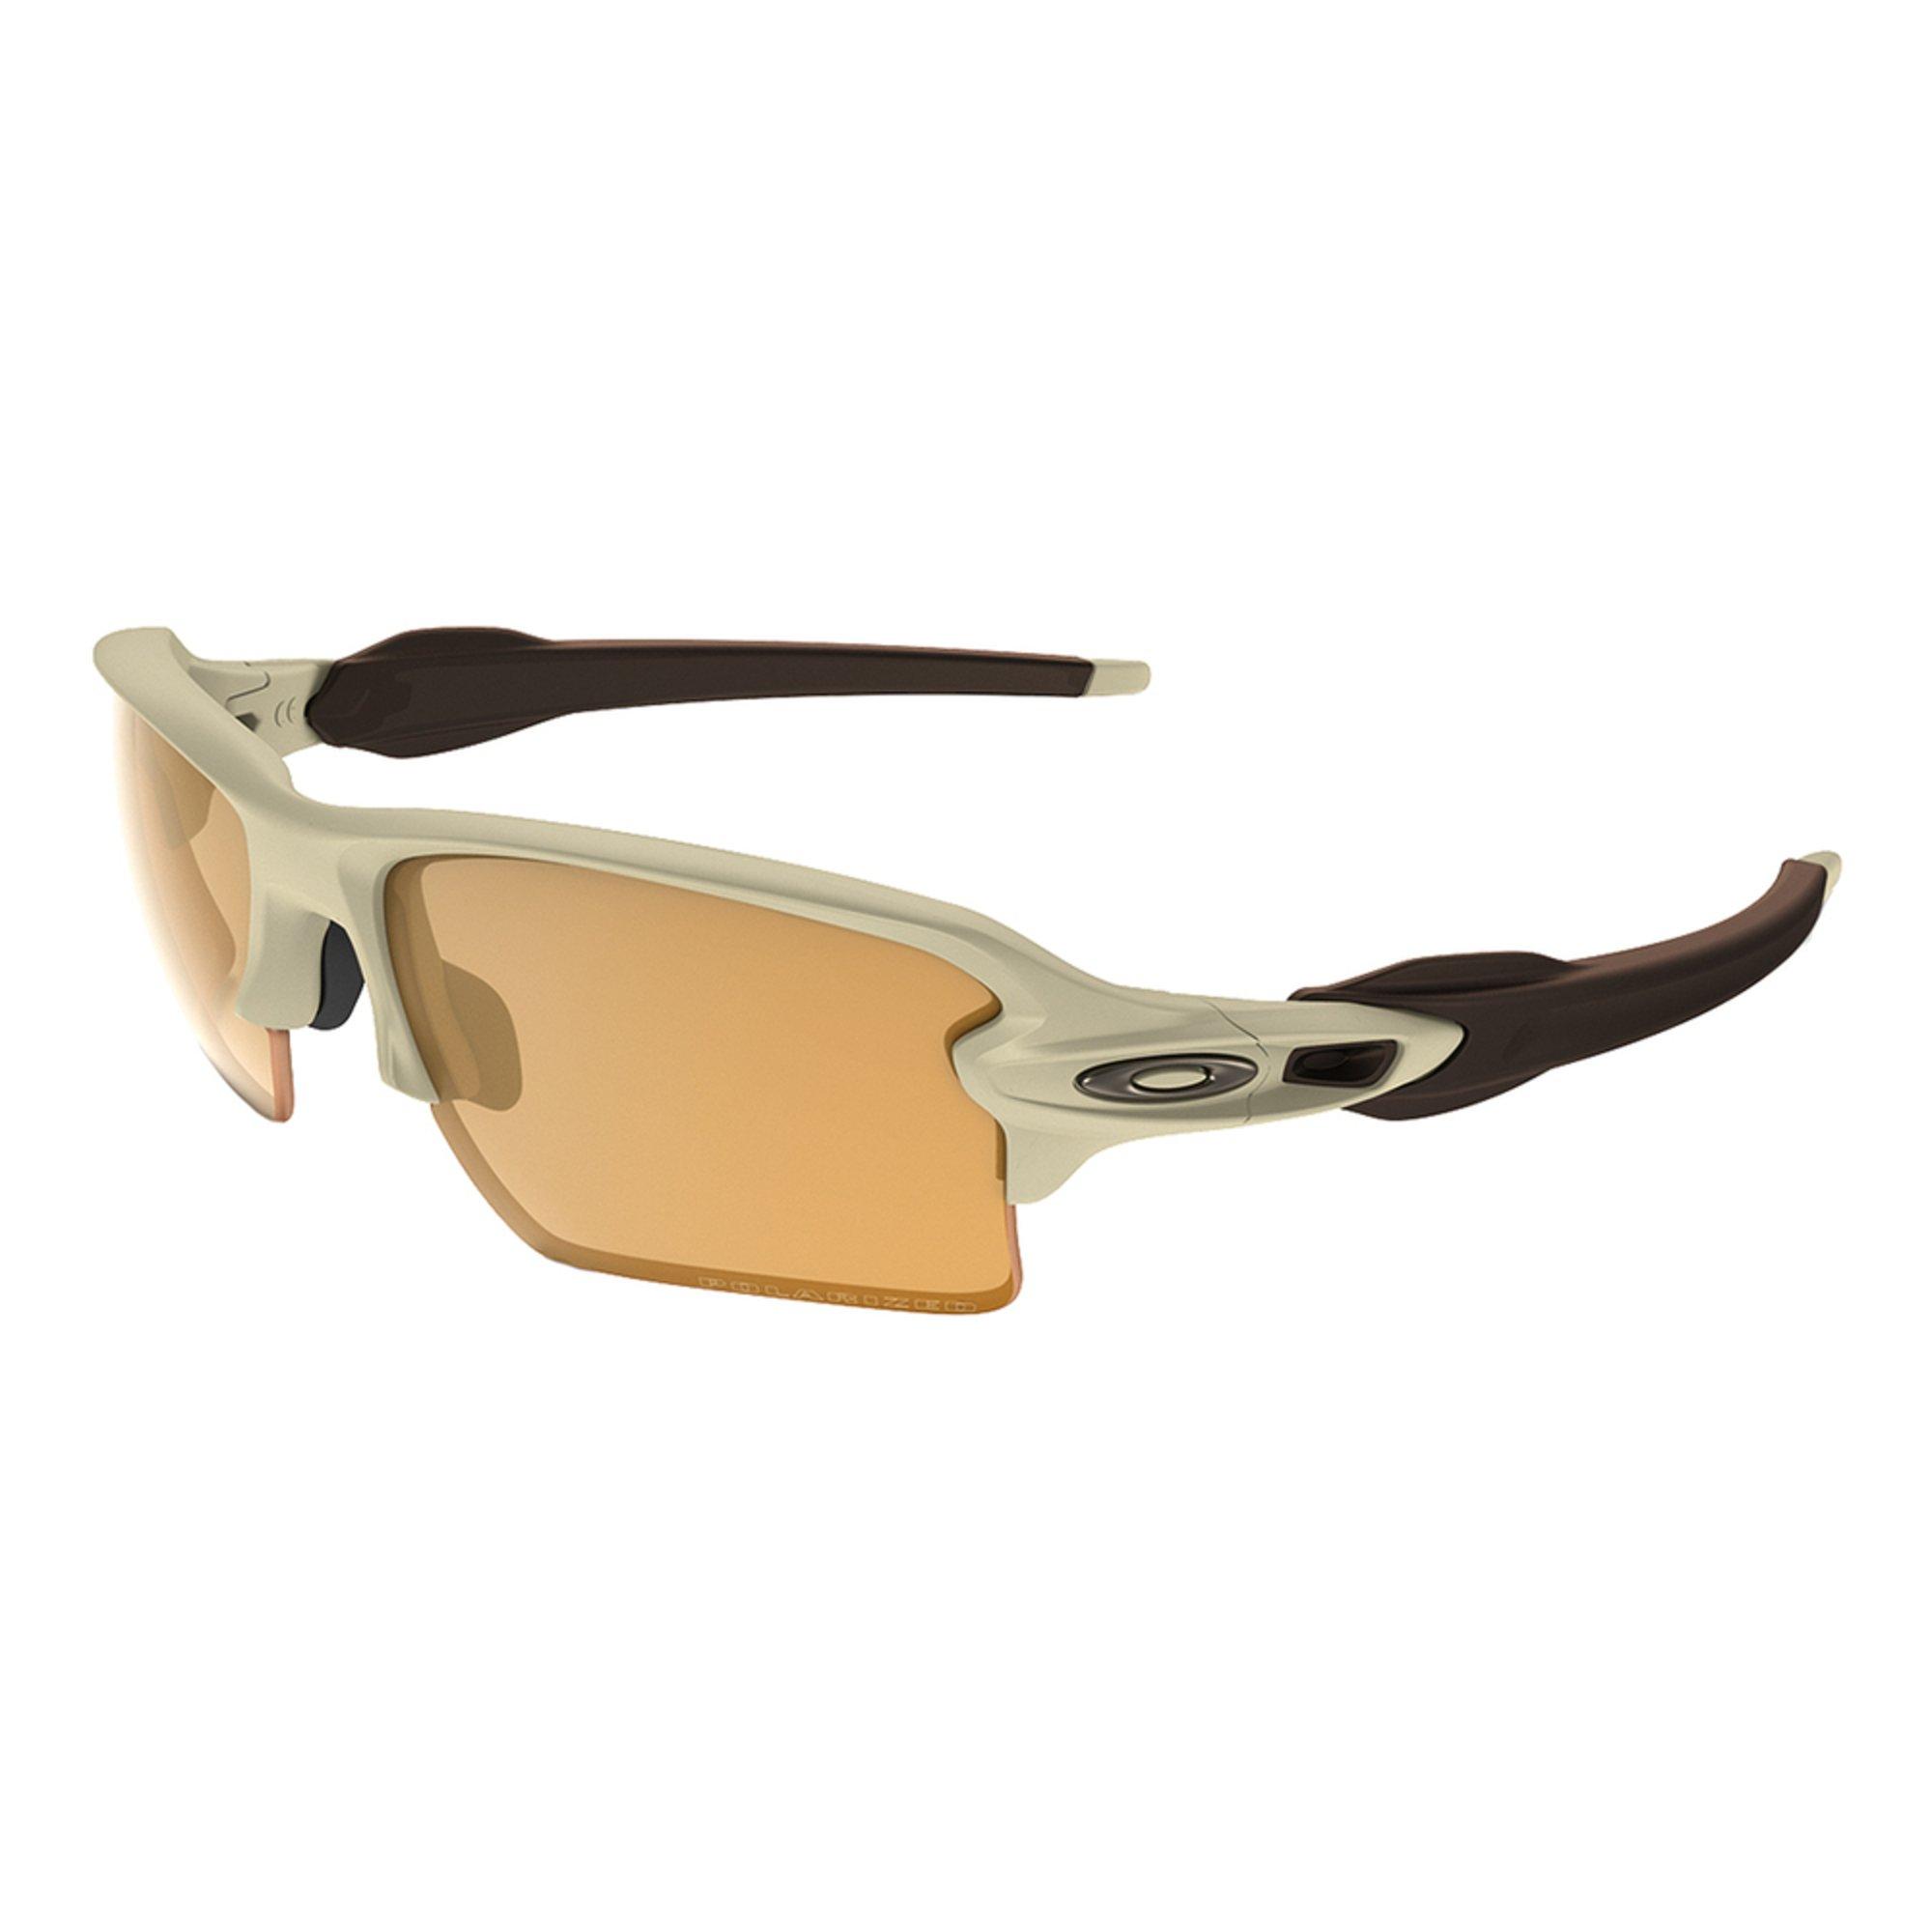 66087c2c0f35 ... cheap oakley. oakley standard issue mens flak jacket 2.0xl polarized  sunglasses 2e091 6babf